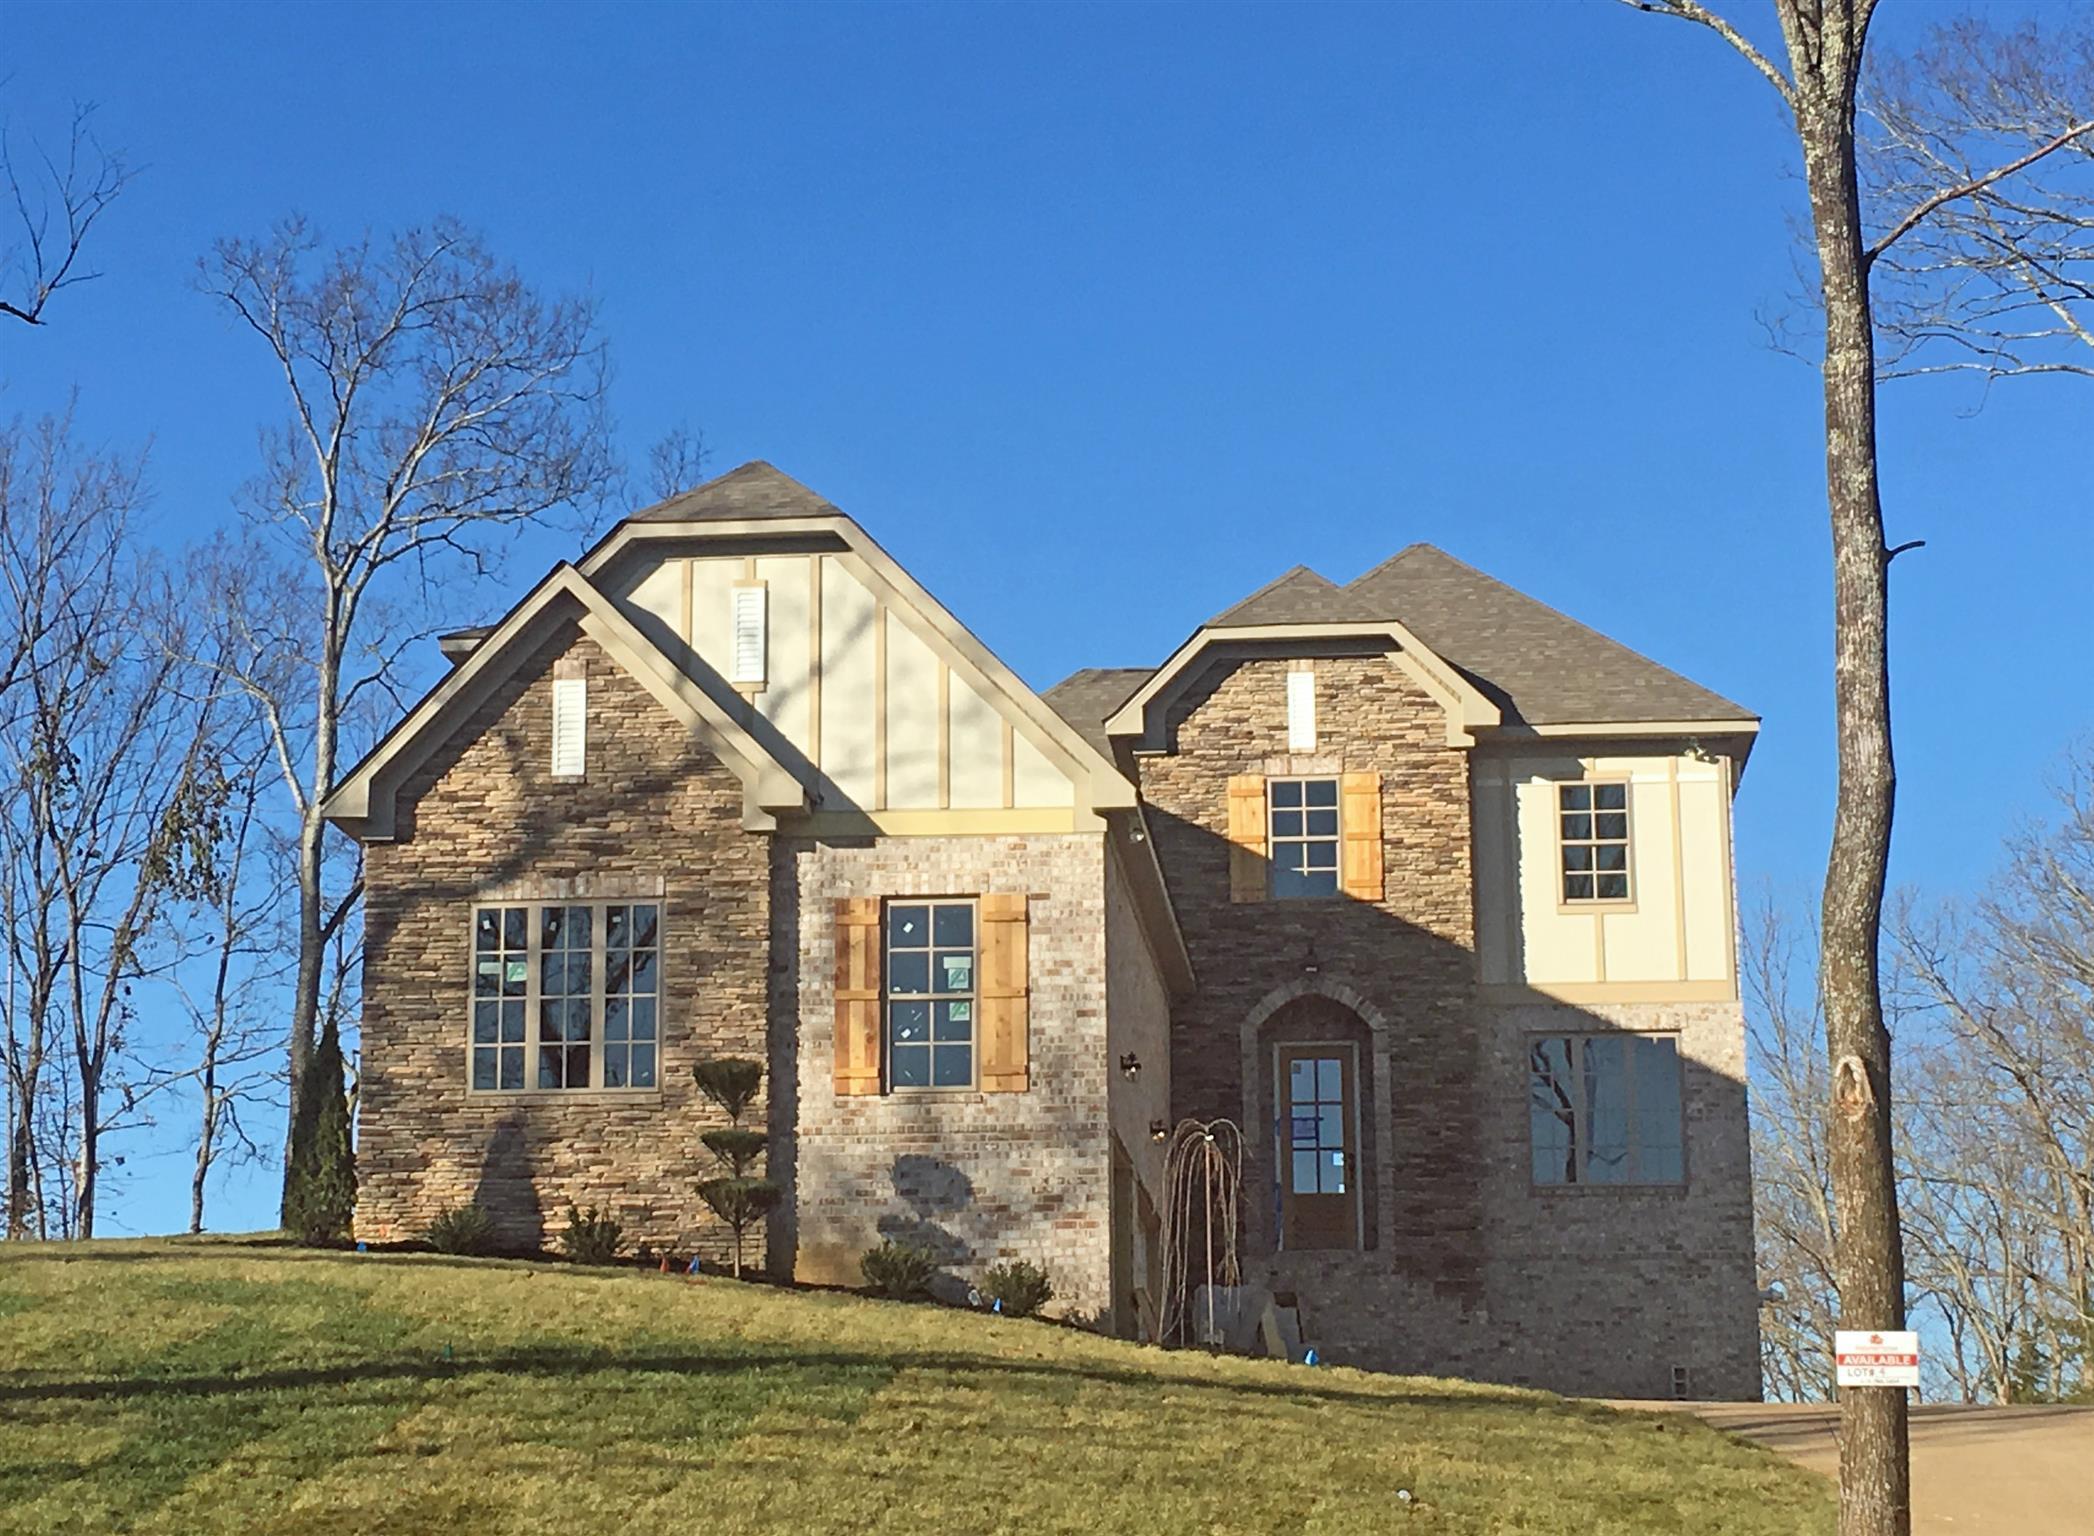 212 Belvedere Cir, Nolensville, Tennessee